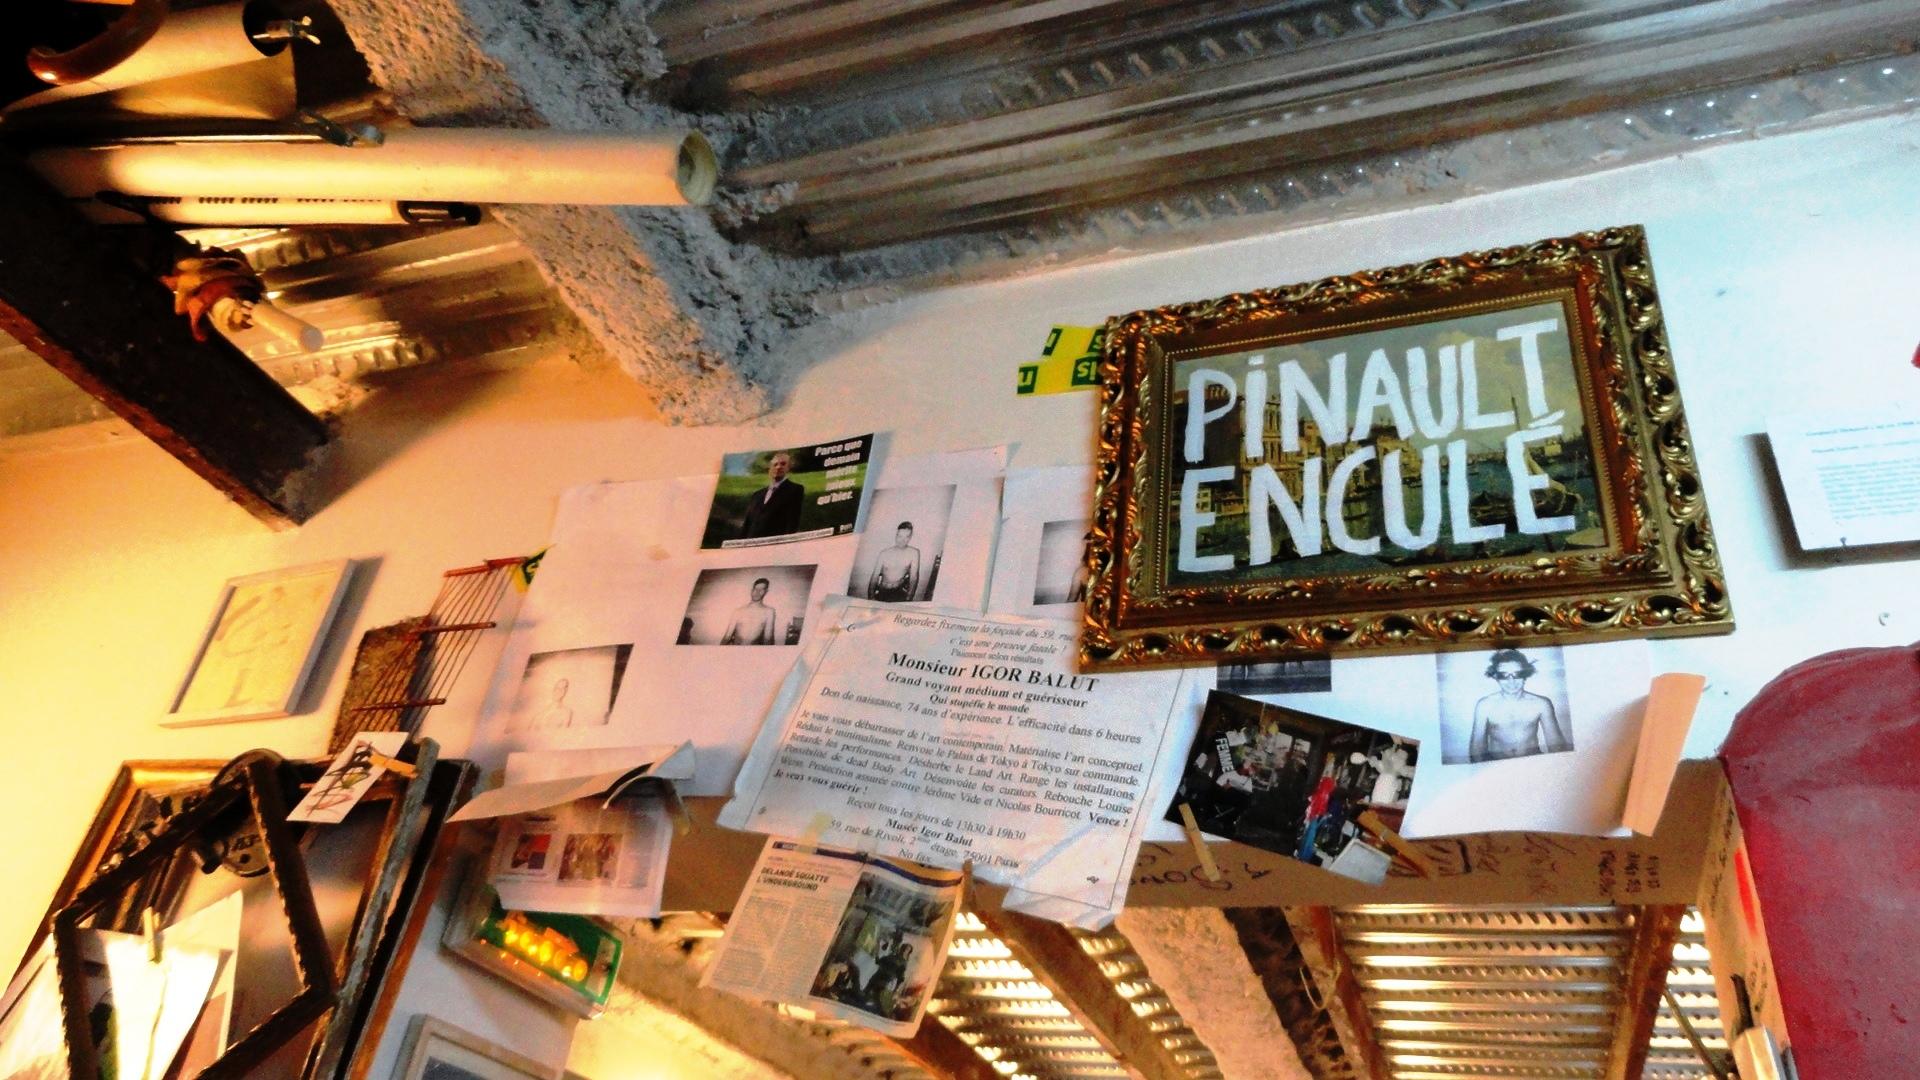 59 rue de Rivoli, Paris 1er - Atelier